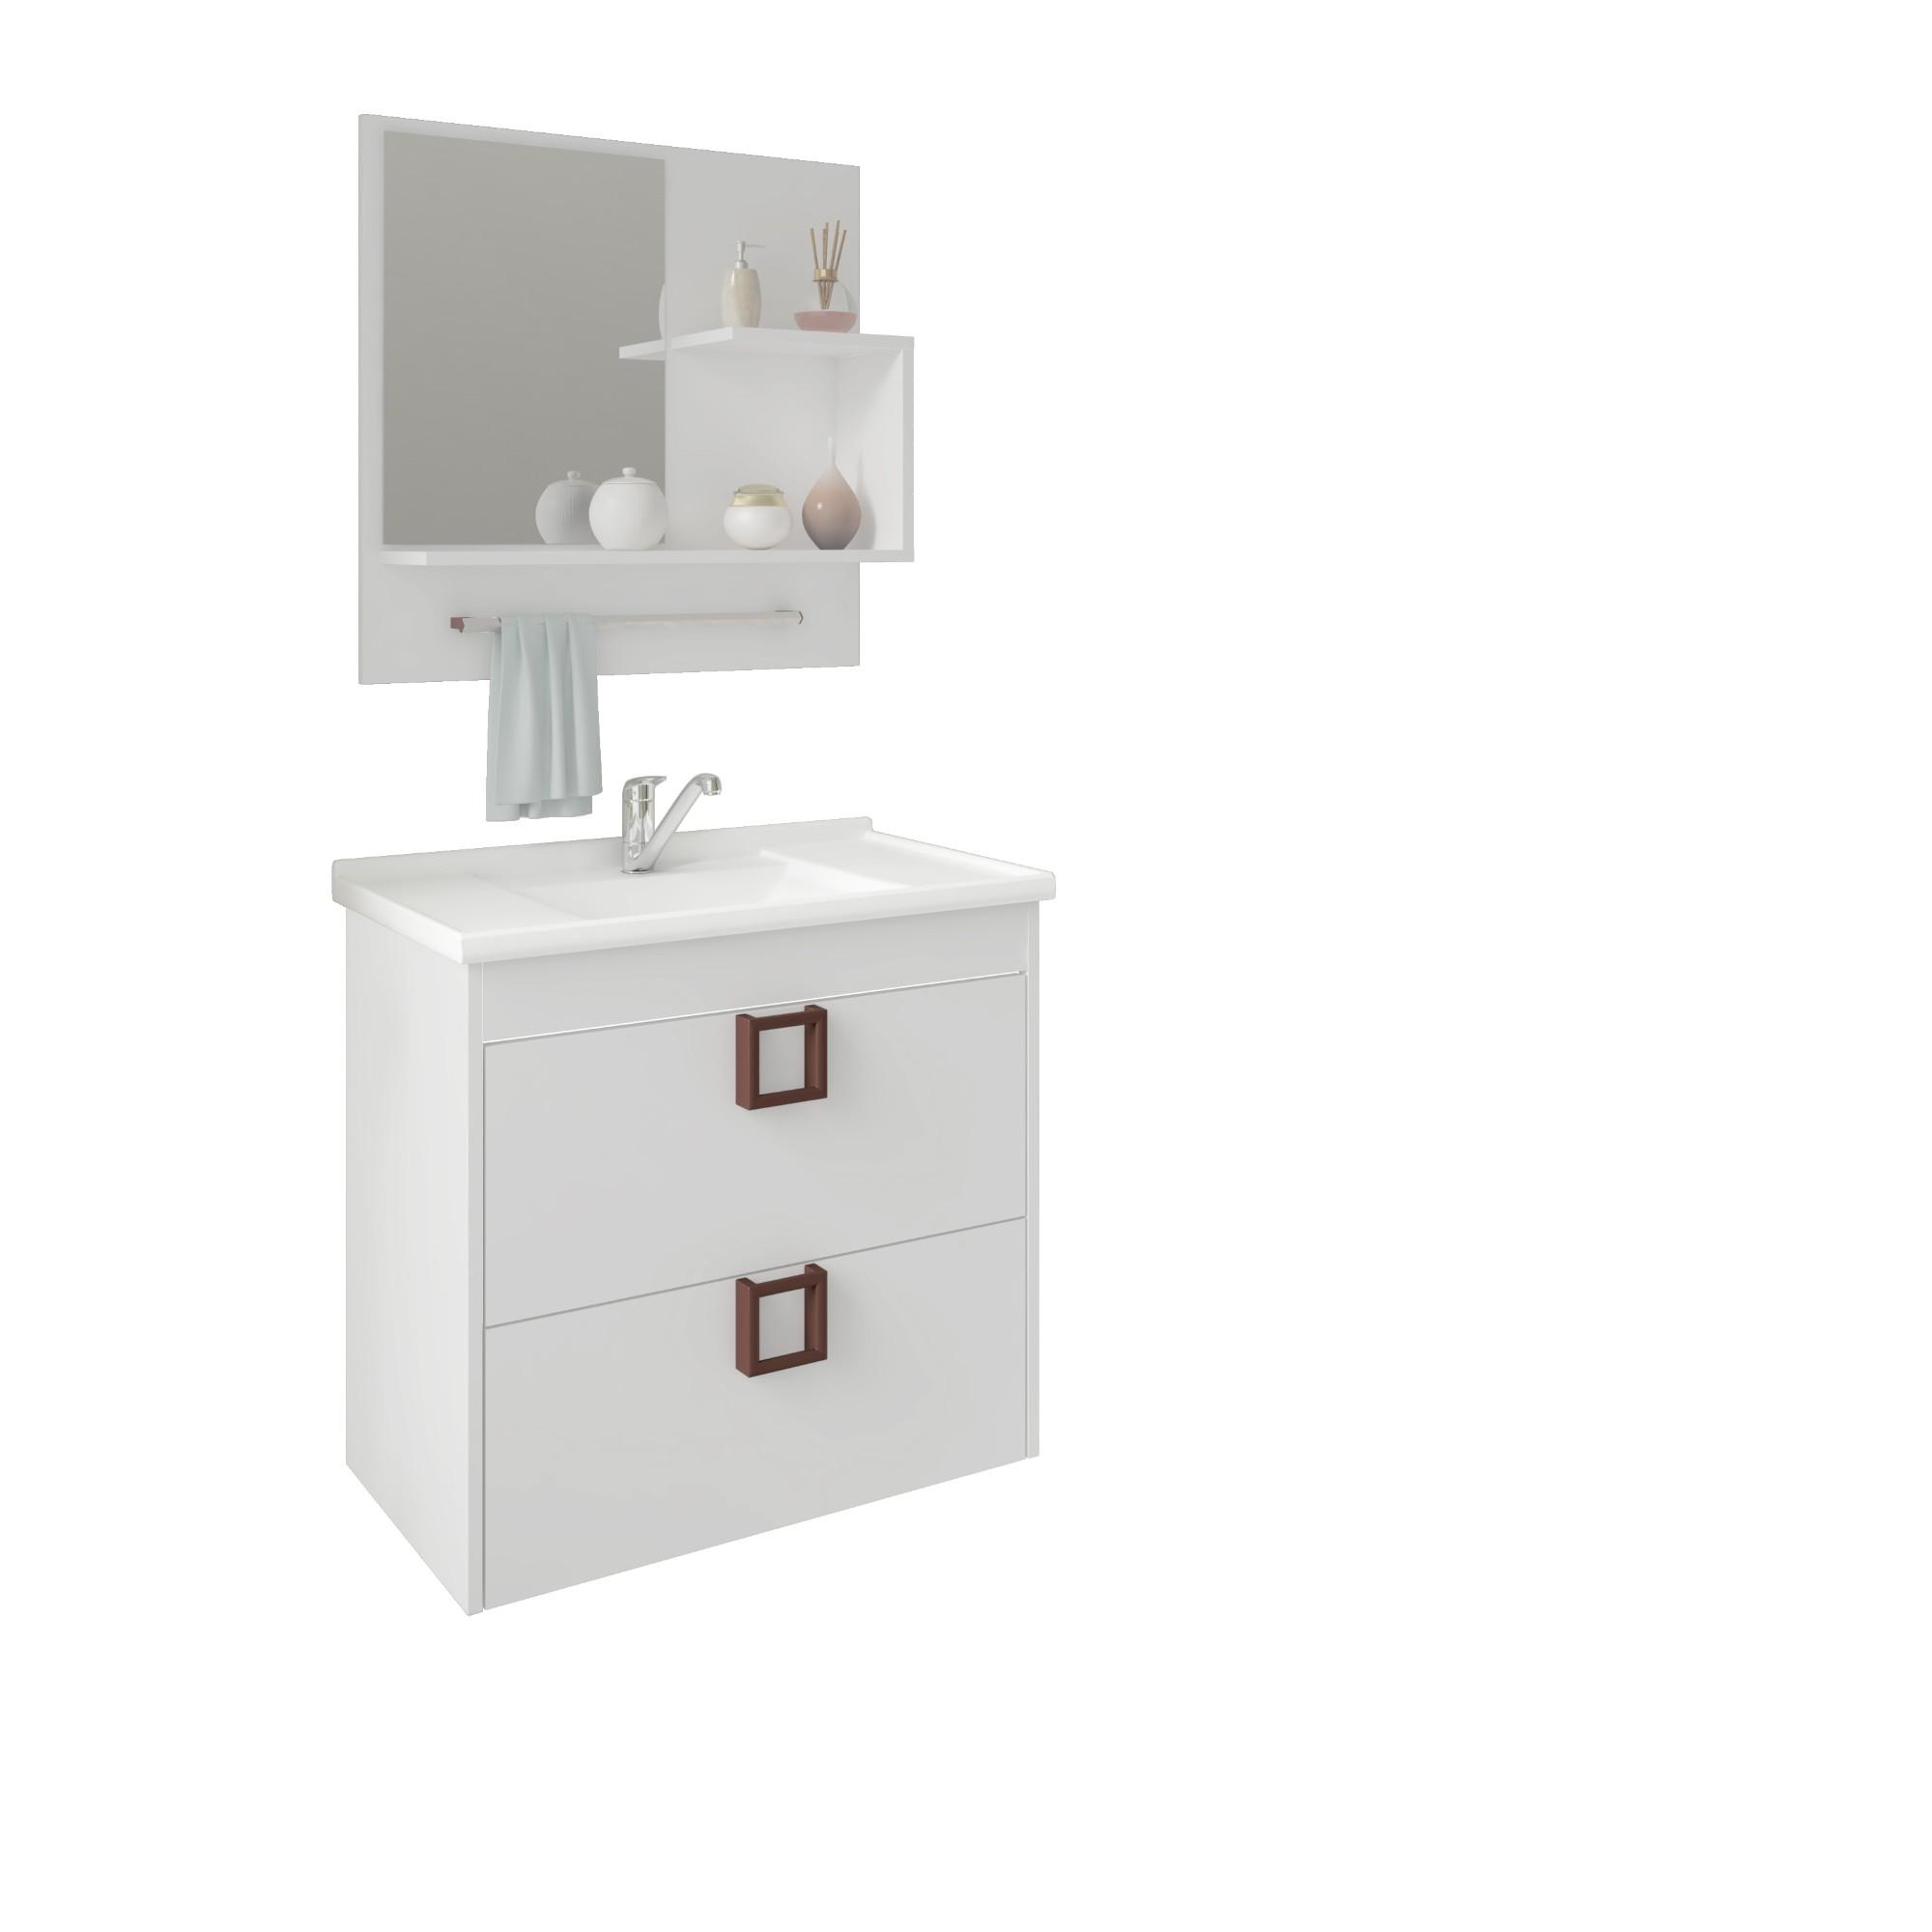 Gabinete para Banheiro 40x59x57cm Lirio Branco - MGM Moveis